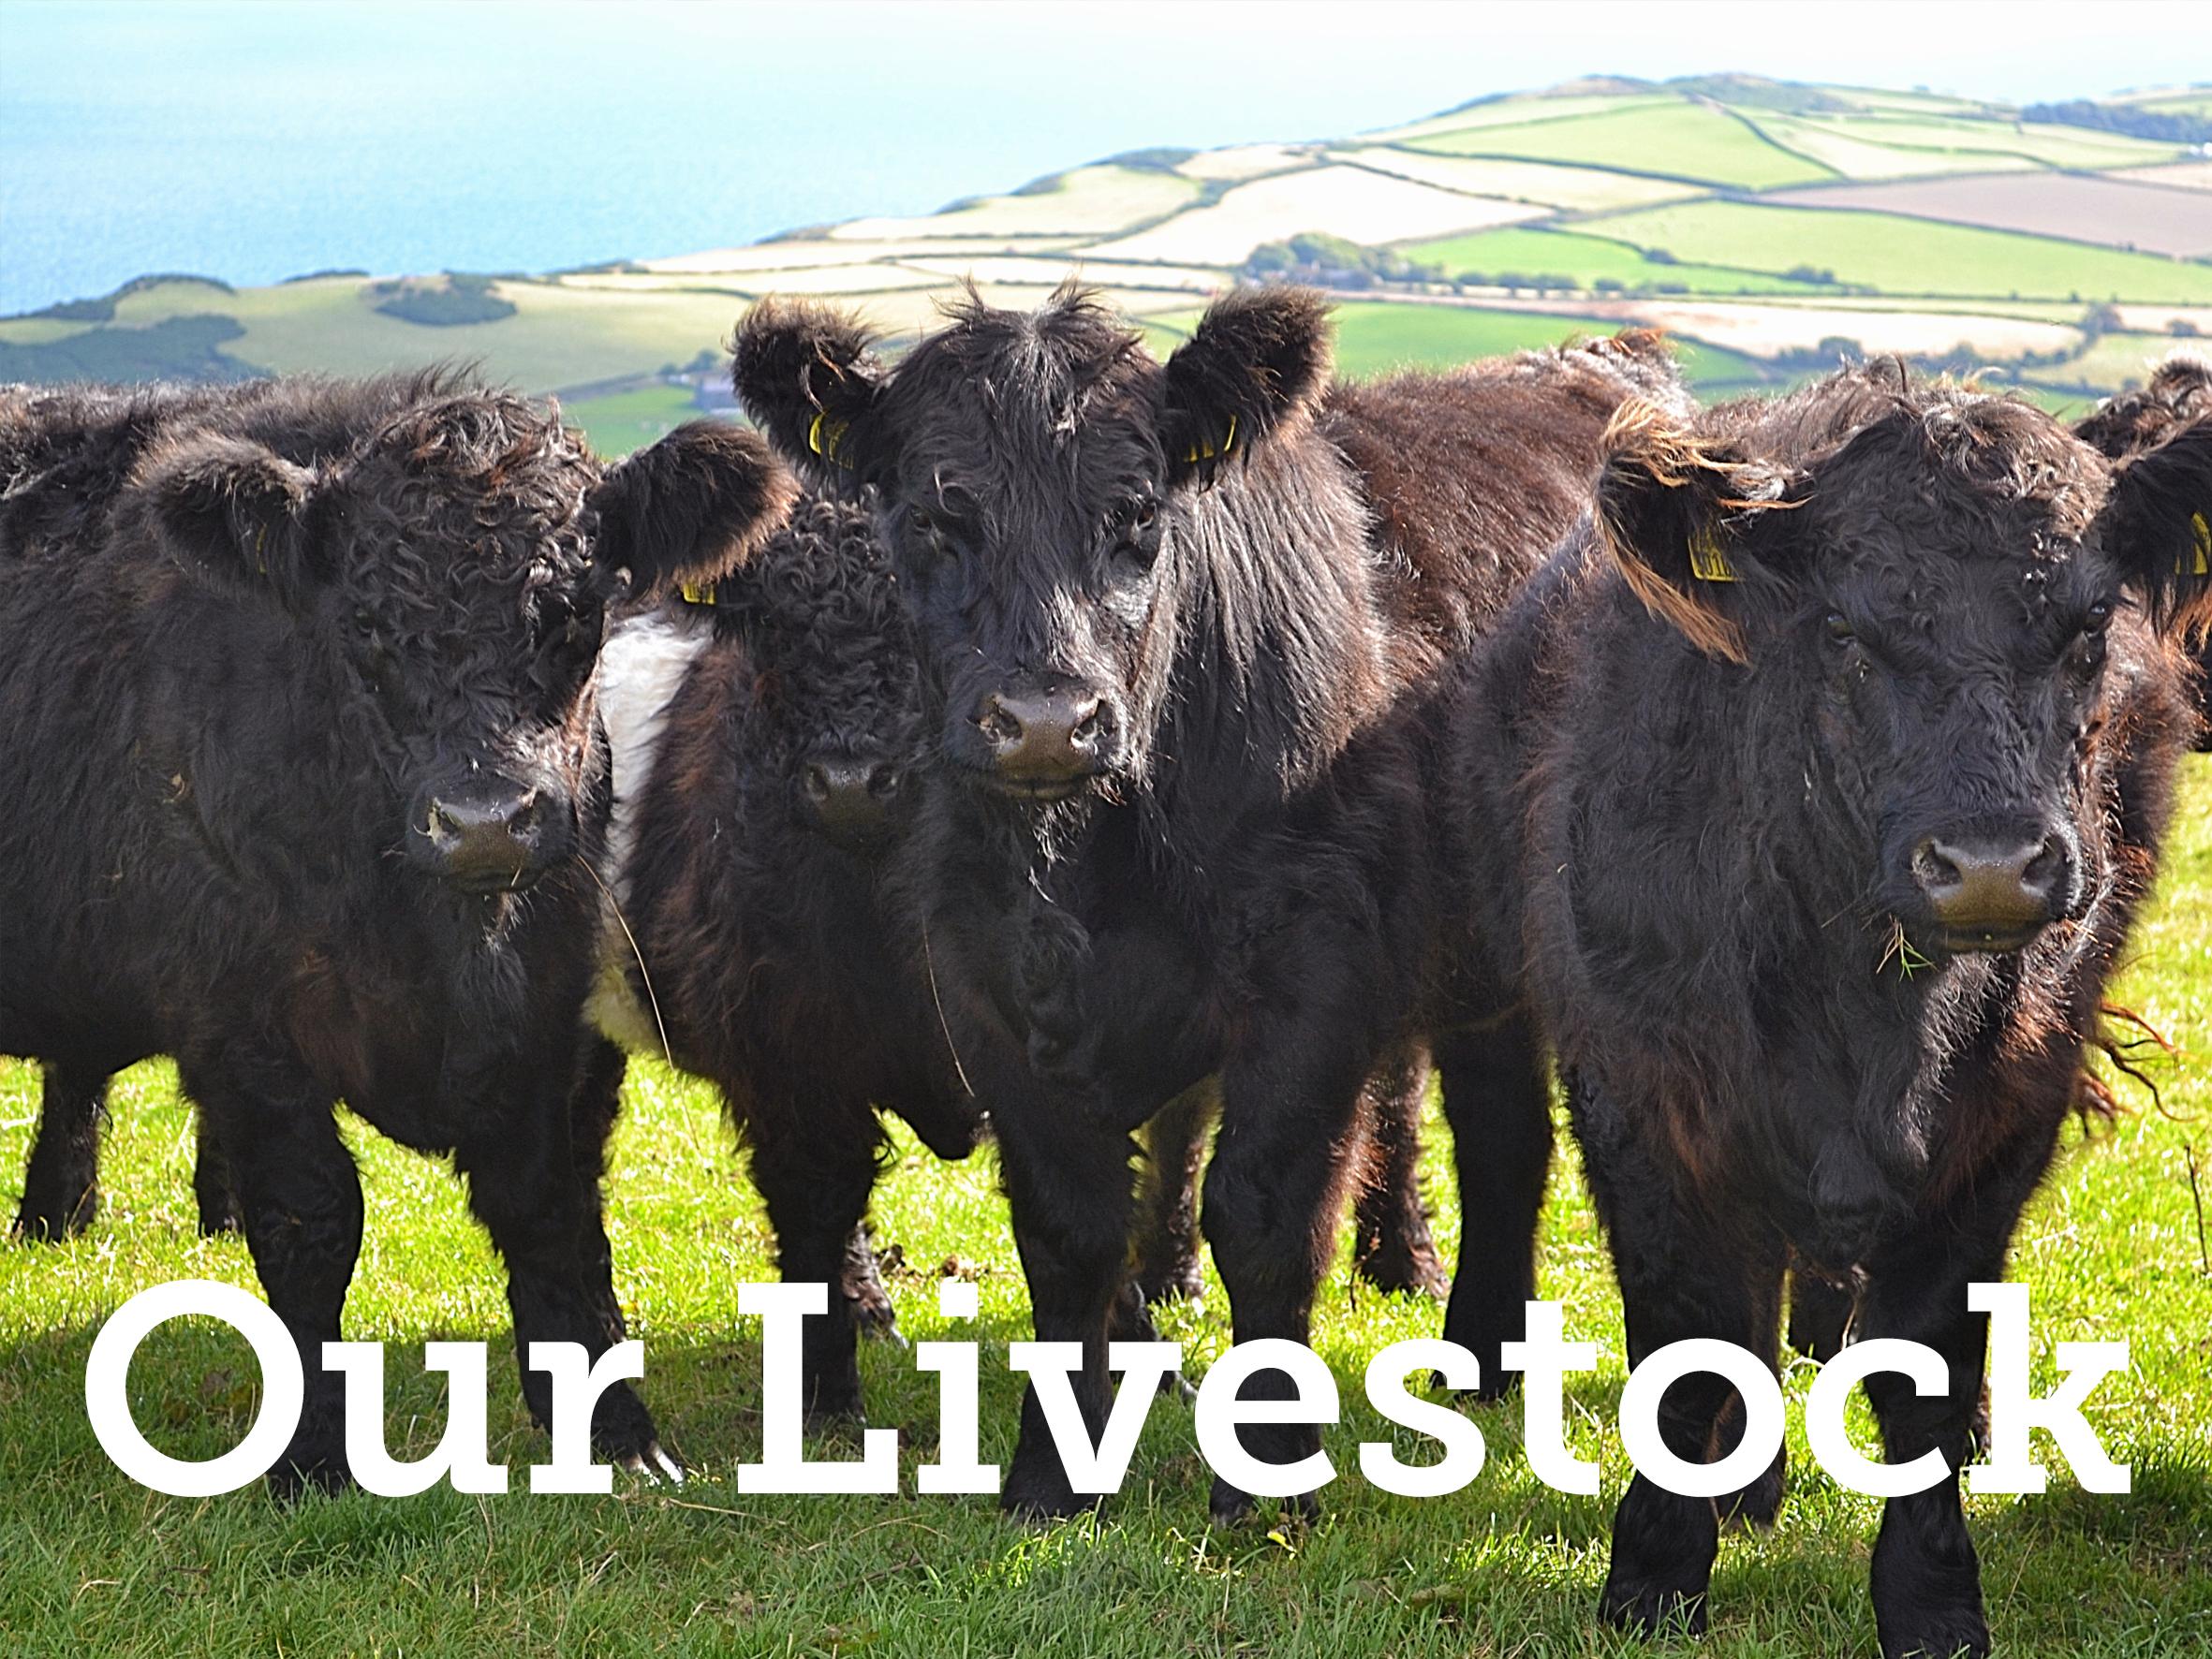 livestock_text.png